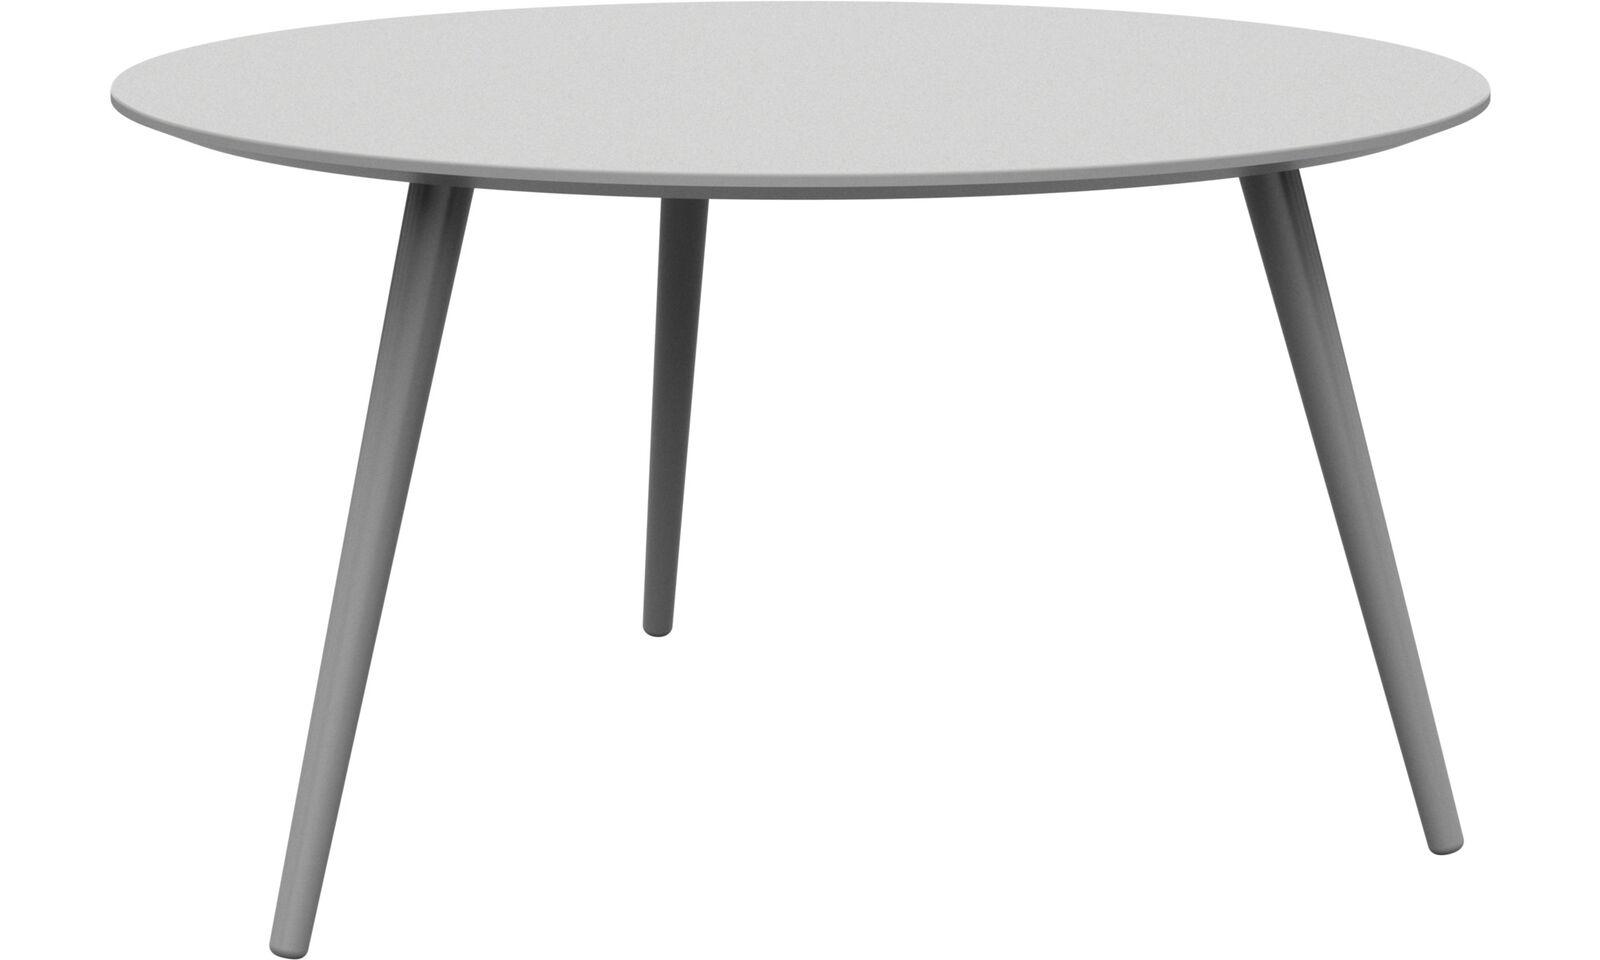 Bornholm coffee table white Large